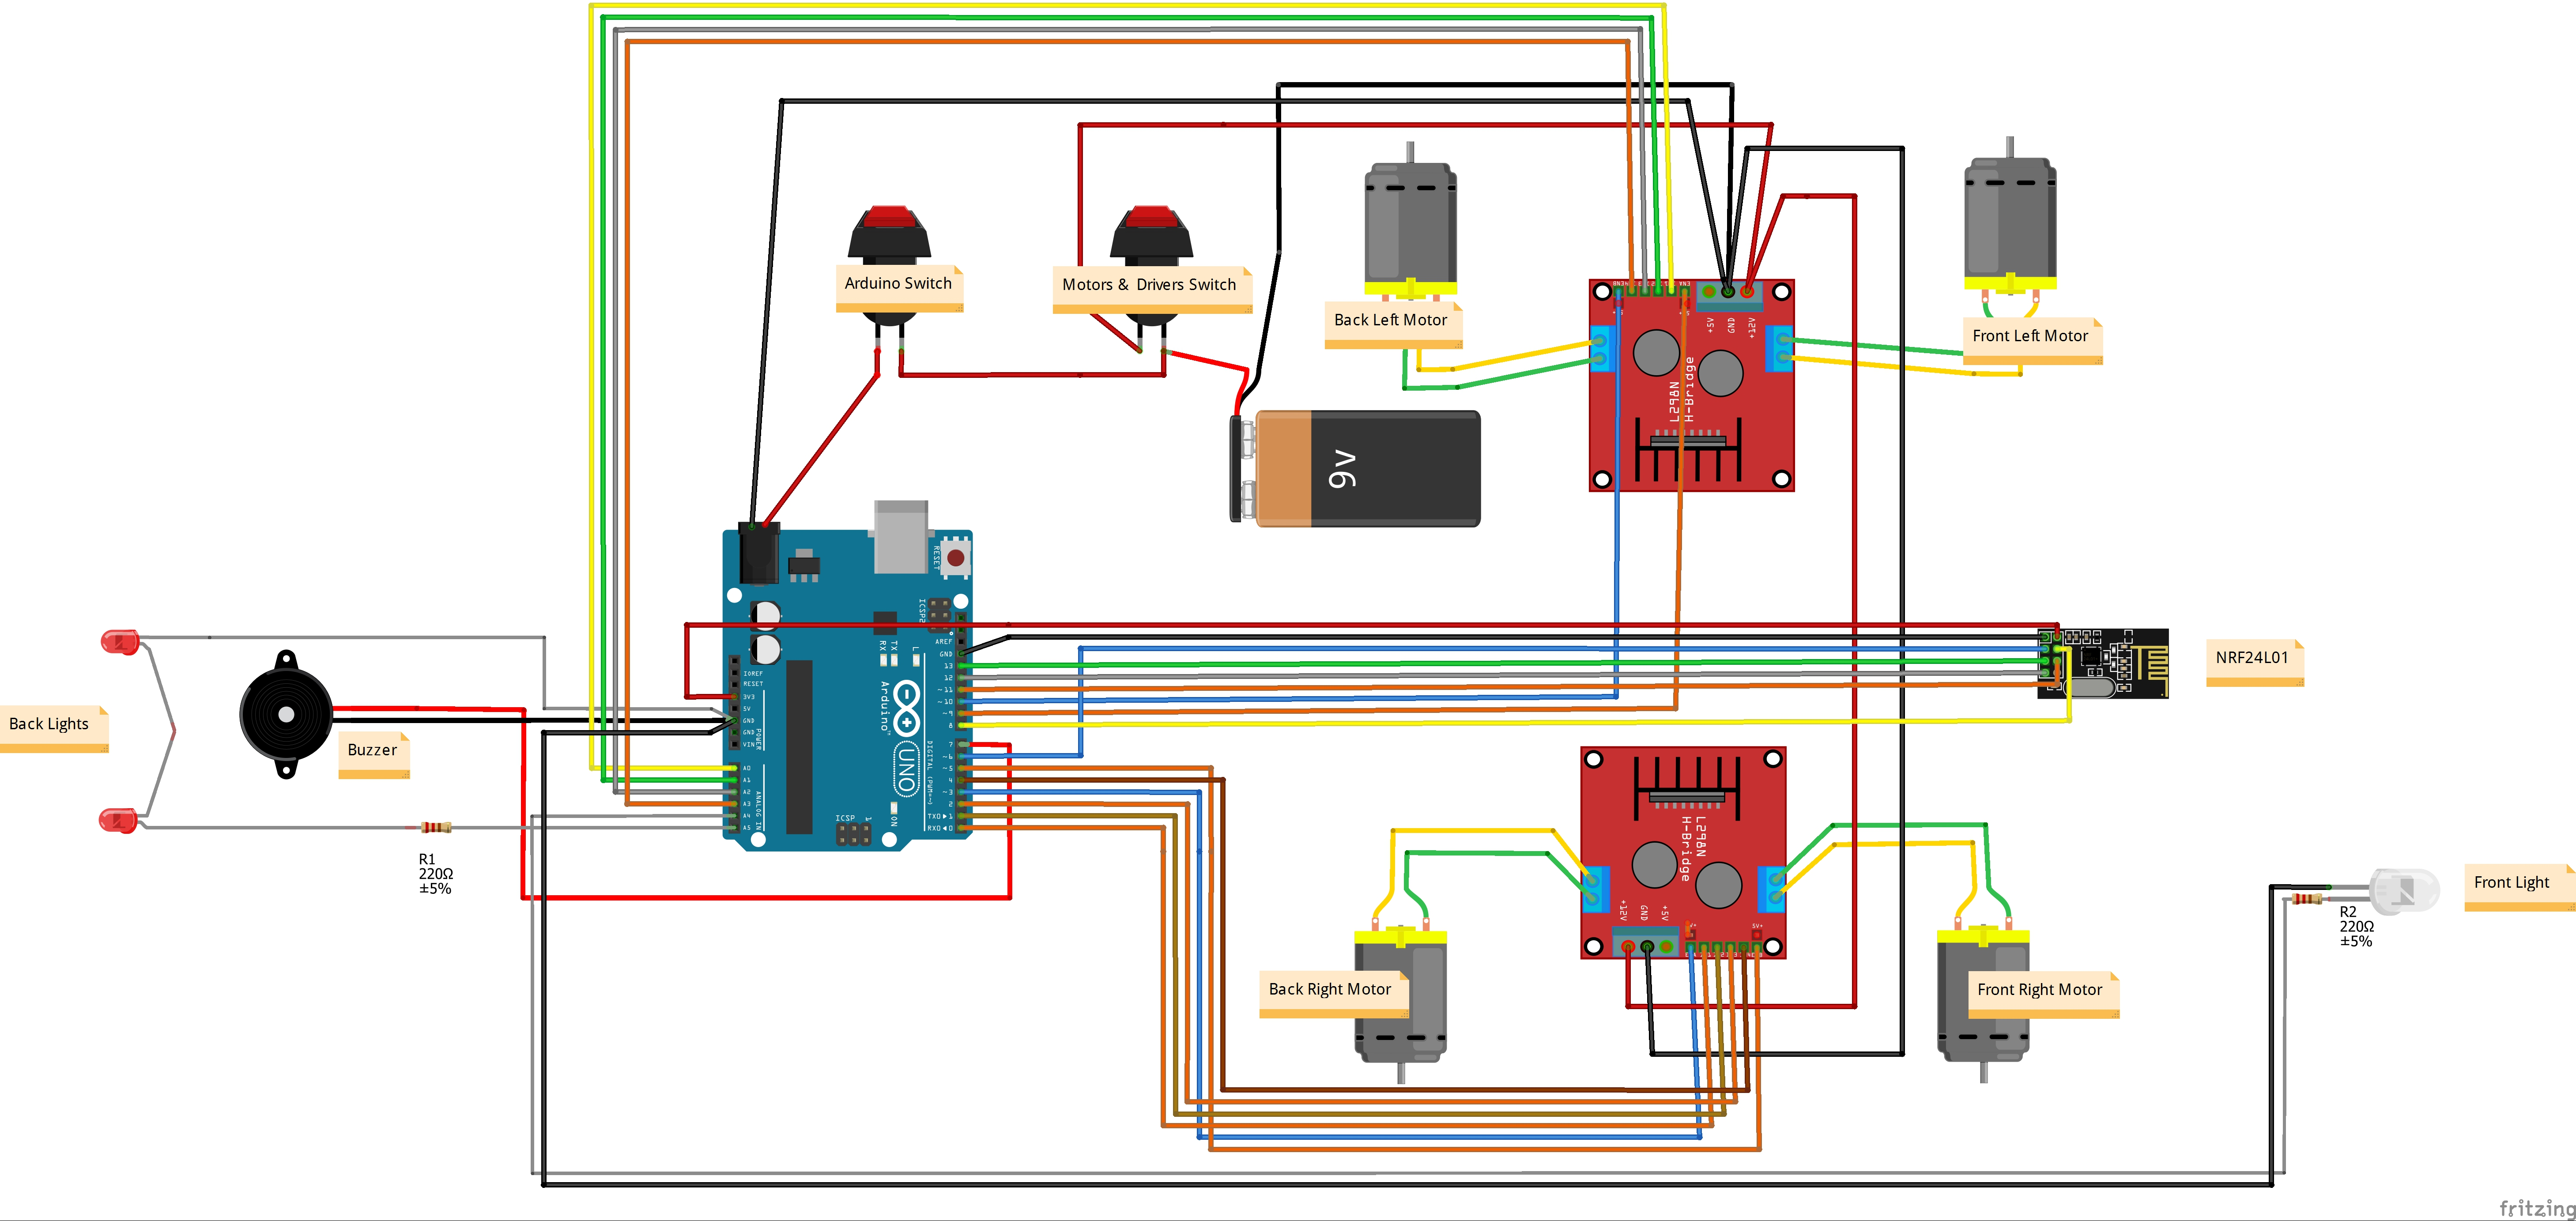 medium resolution of rc car wiring diagram wiring diagrams scematic solidworks rc car of rc car wiring schematic